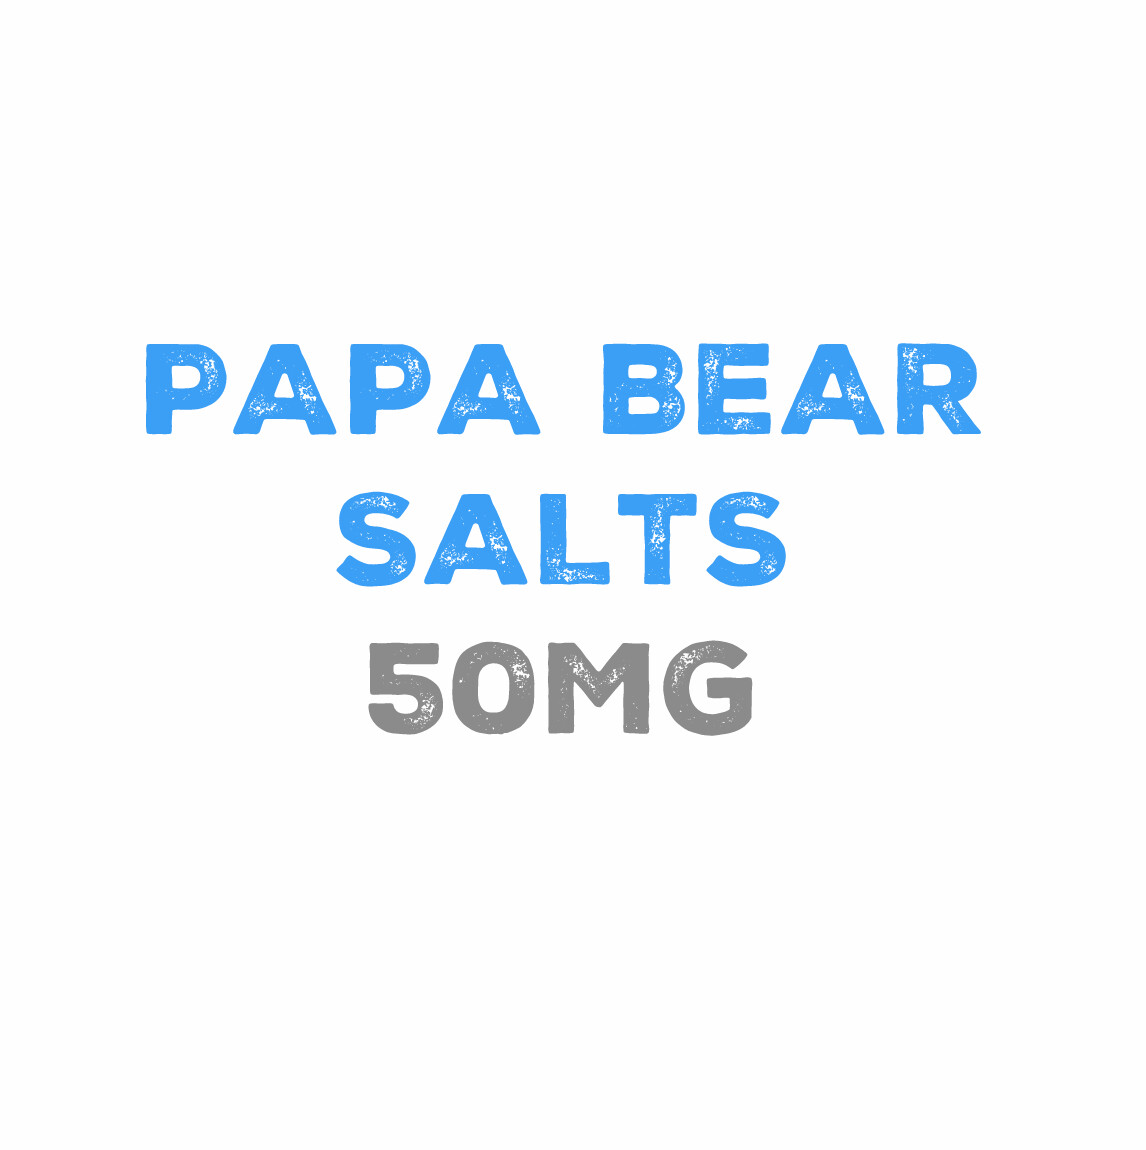 Papa Bear Salts 50mg